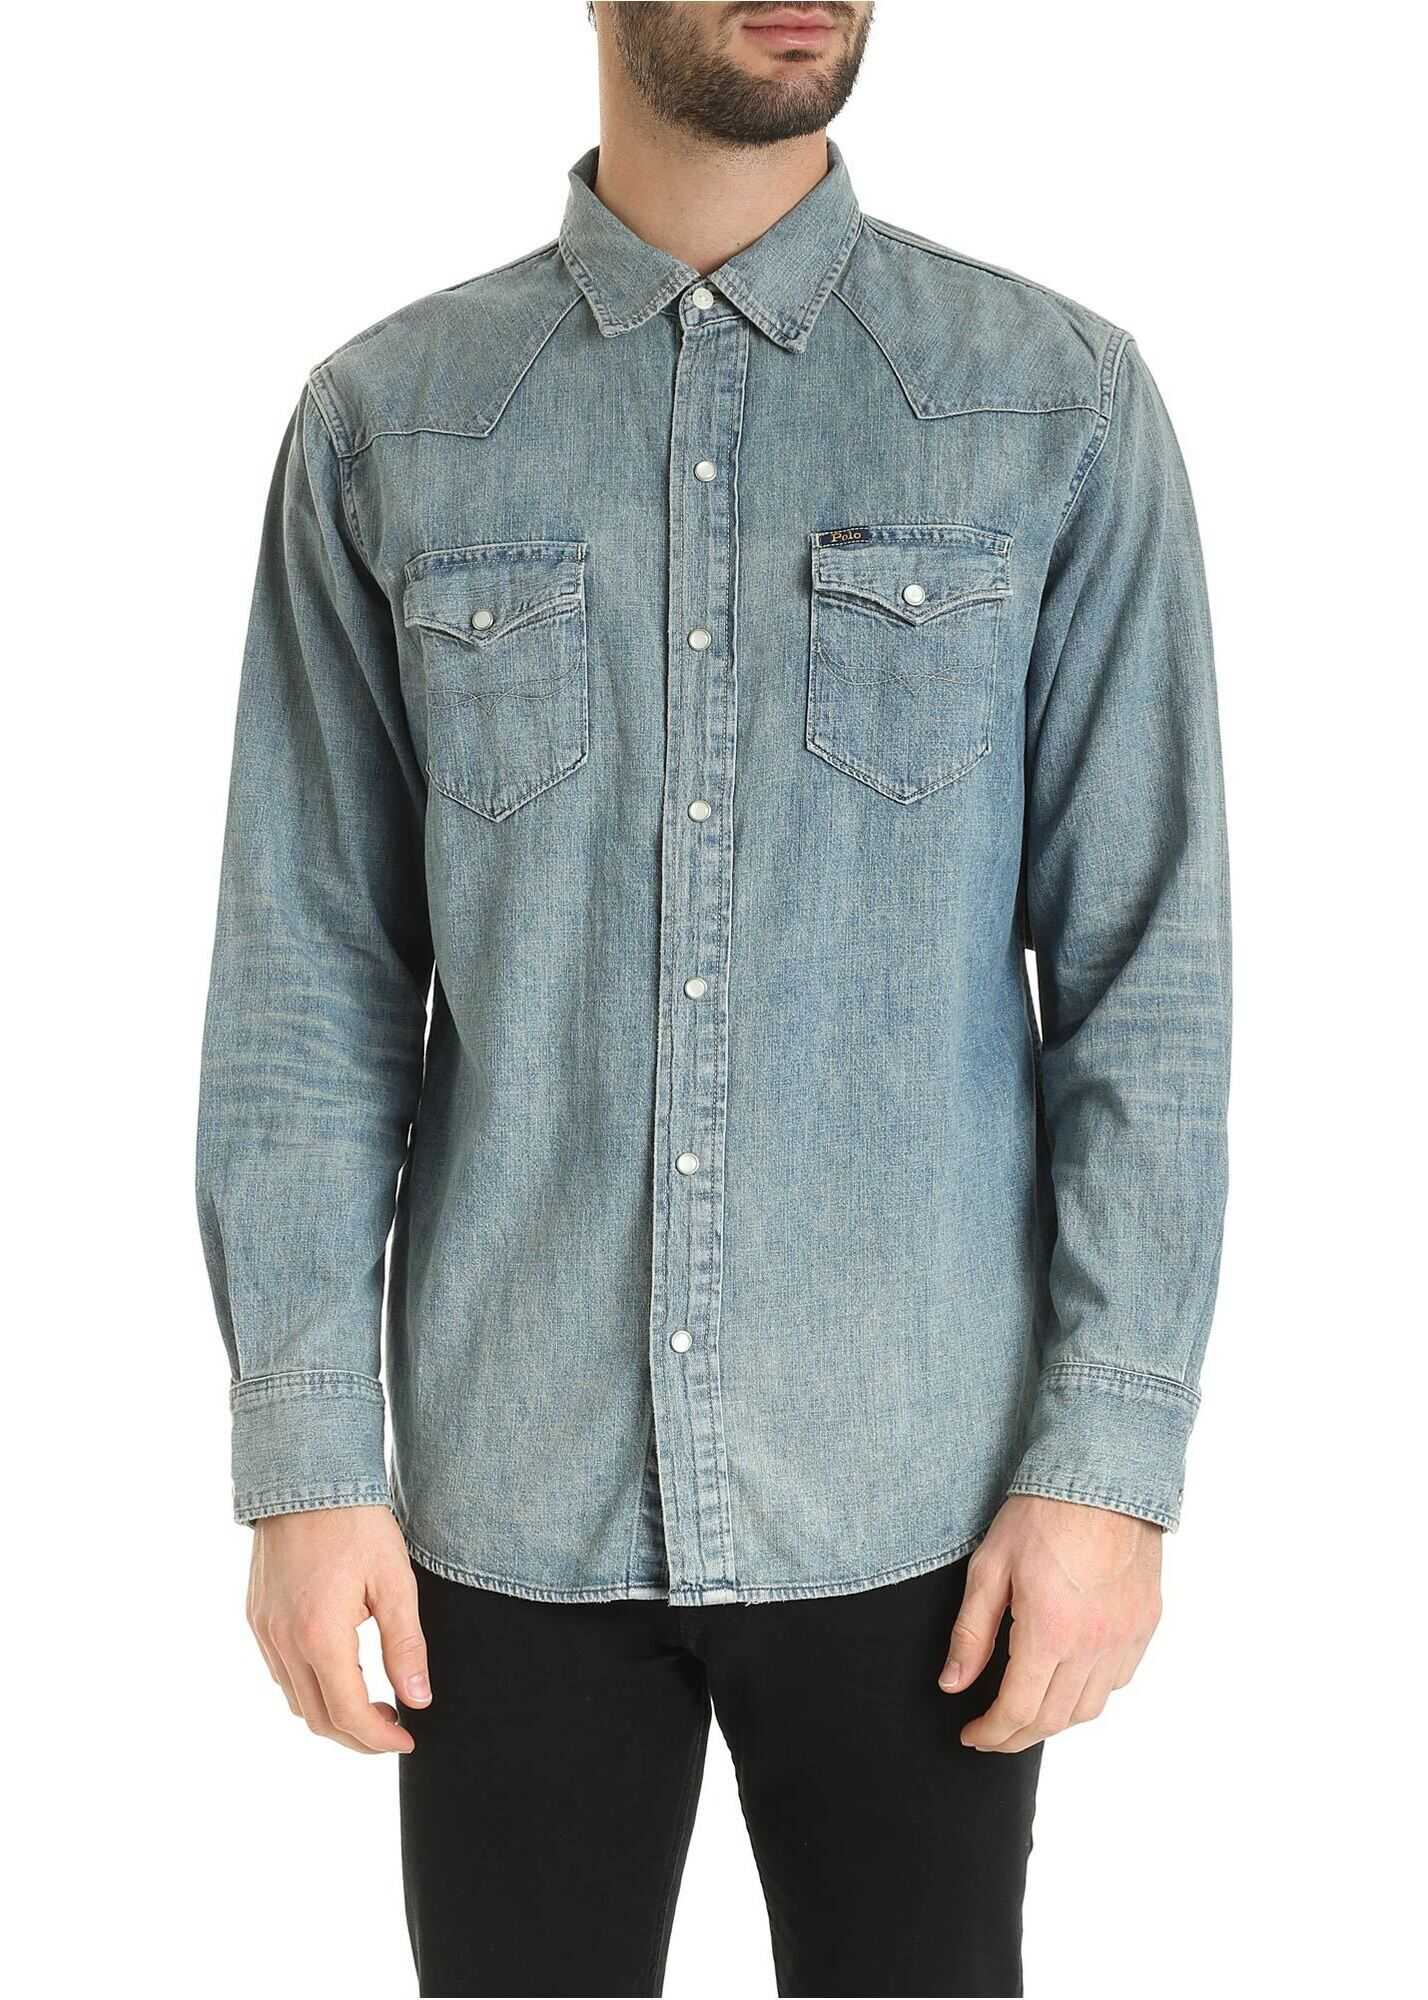 Ralph Lauren Icon Western Shirt In Faded Blue Light Blue imagine